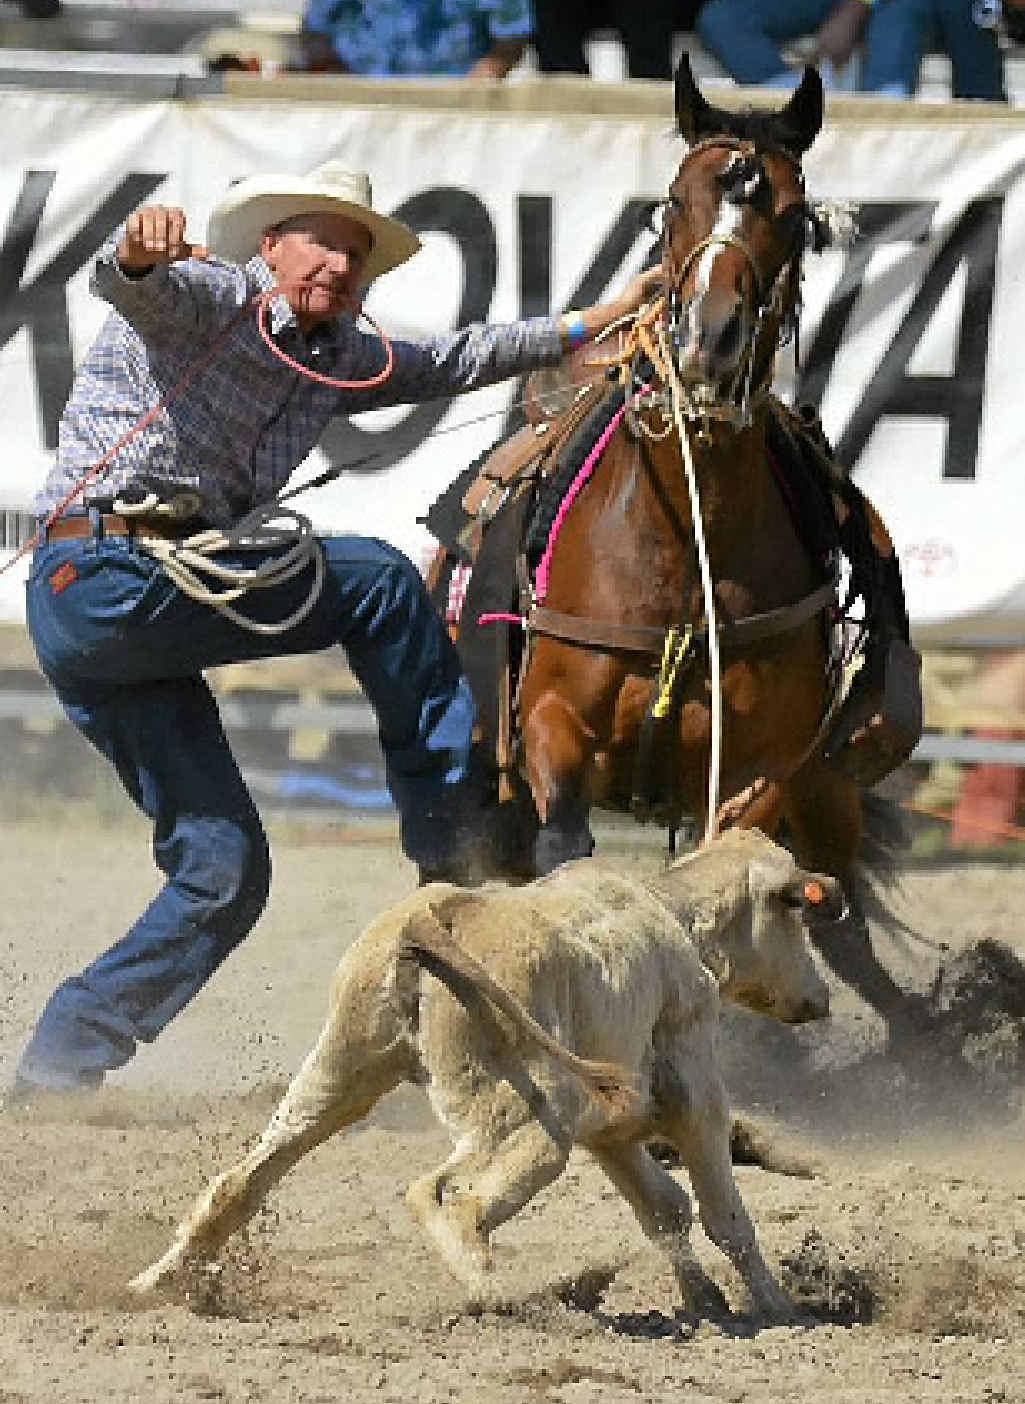 Allen Warwick Porn allan flood credits horse in roping win | chinchilla news